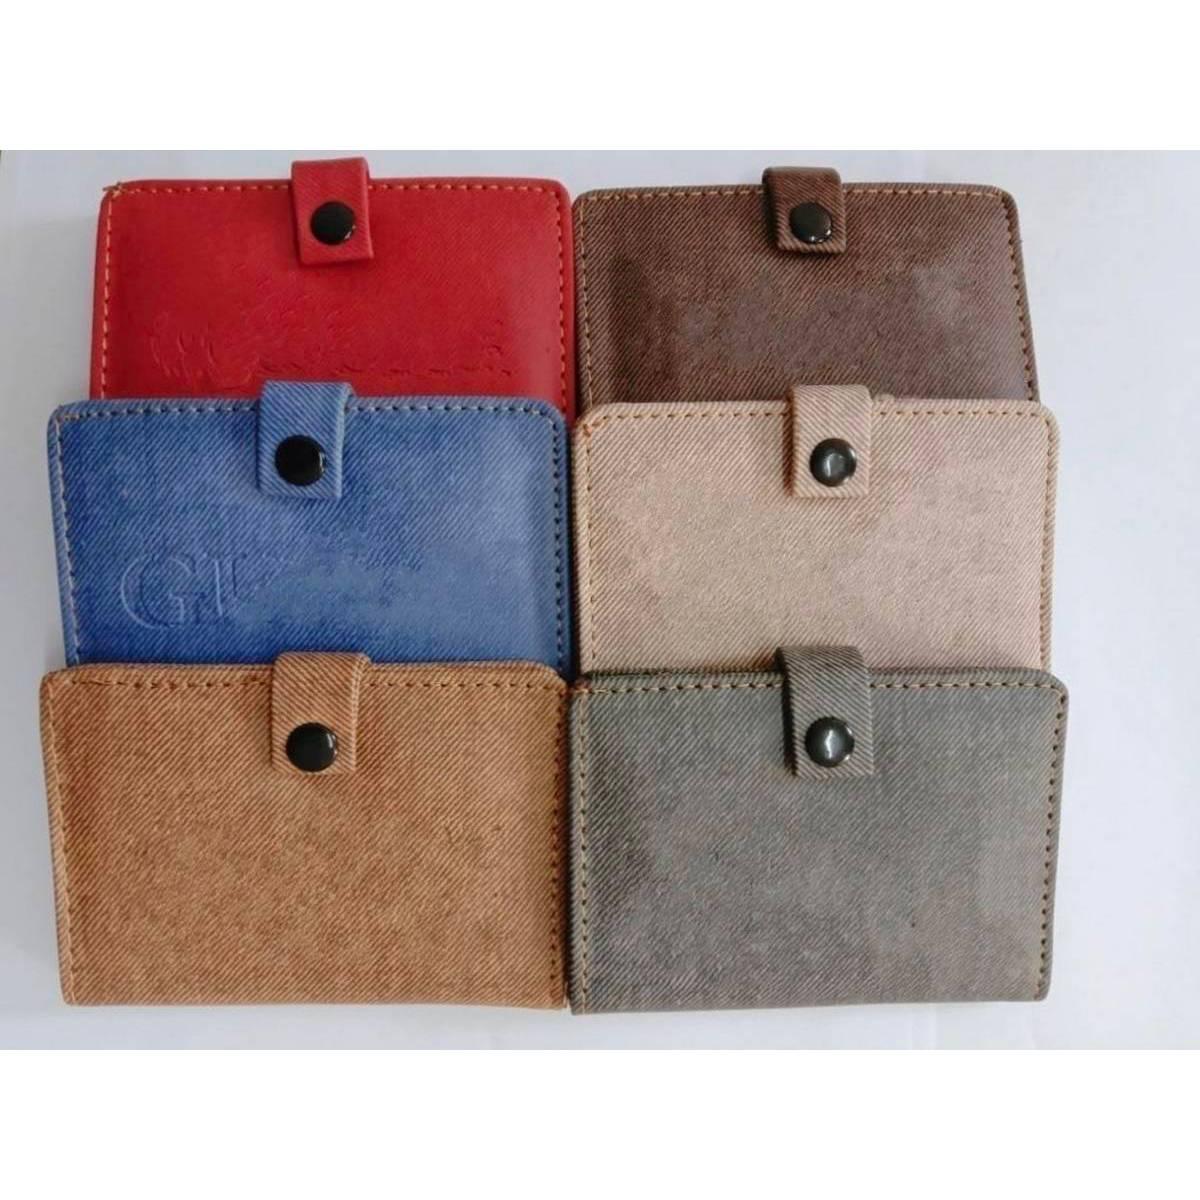 Slim Pocket Friendly Small Wallet For Men cardholder